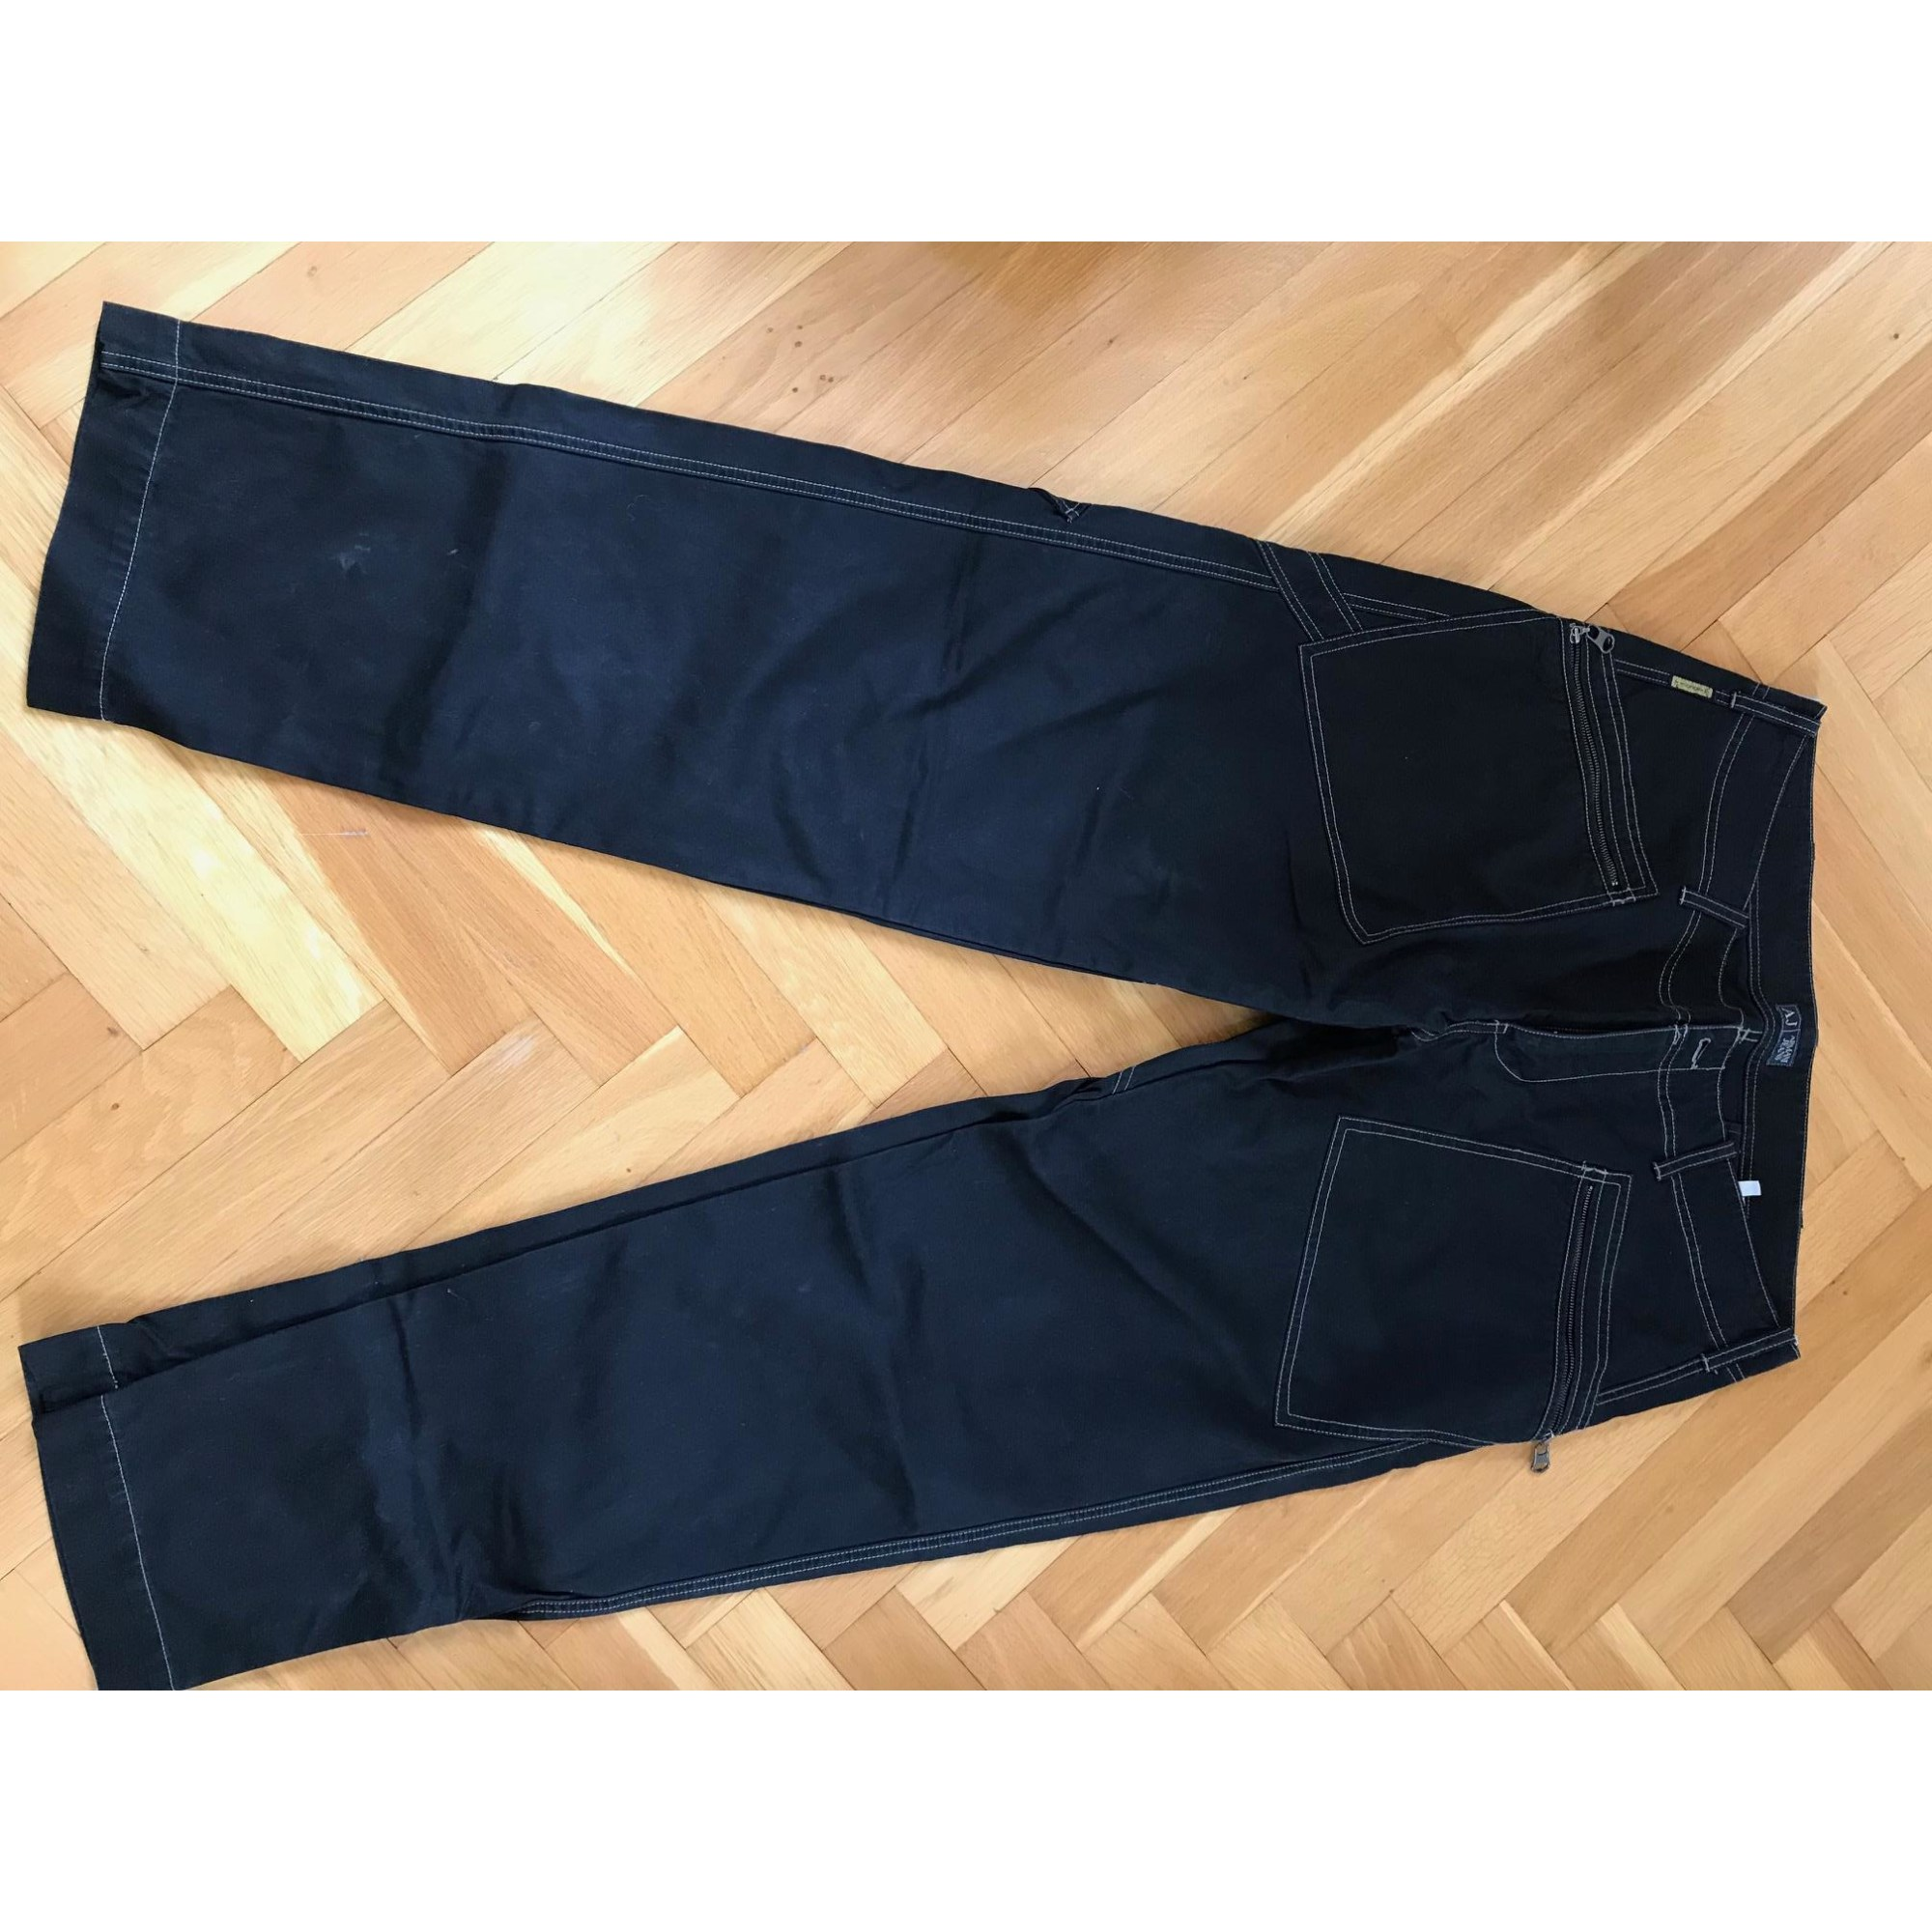 Straight Leg Pants ARMANI JEANS Black